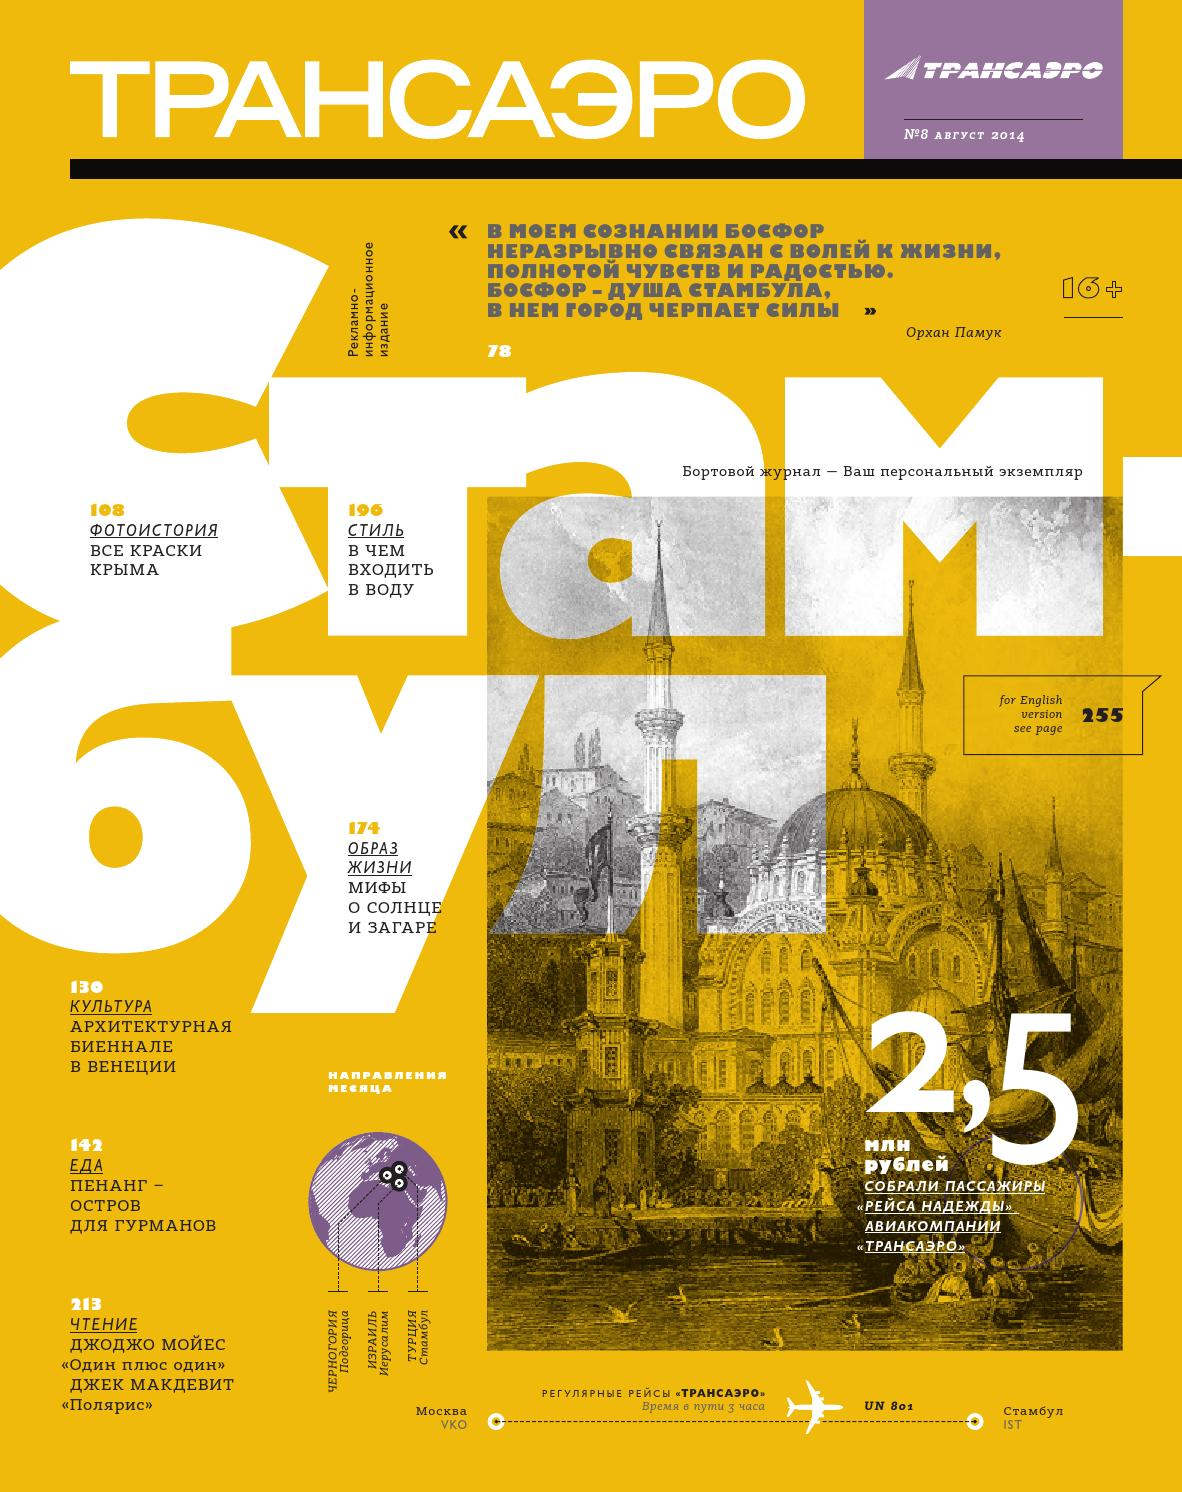 a1cb2d0c5cc4 Transaero Magazine  08 2014 by TA Magazine - issuu